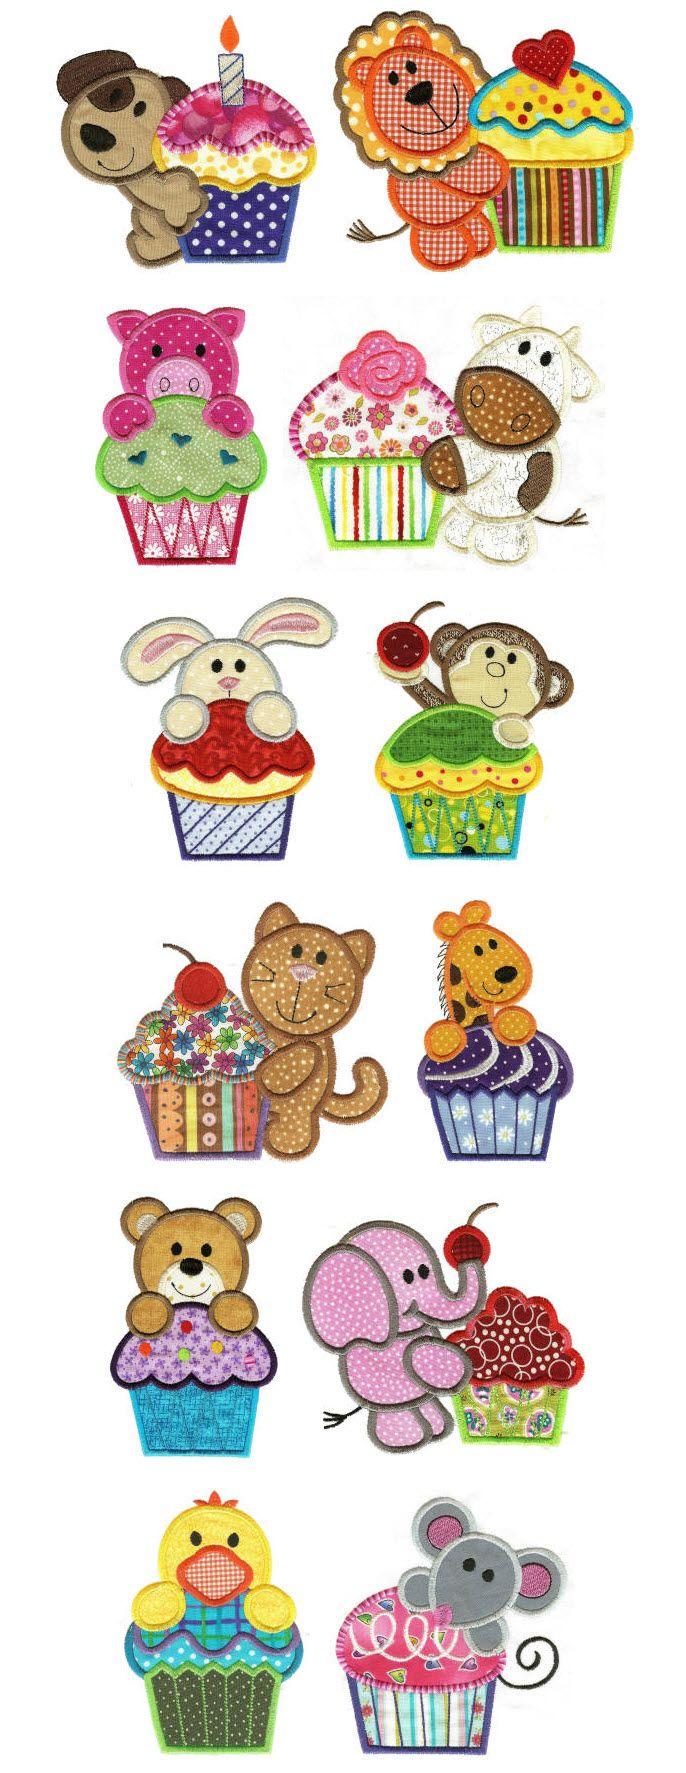 Embroidery Designs | Applique Machine Embroidery Designs | Cupcake Critters Applique